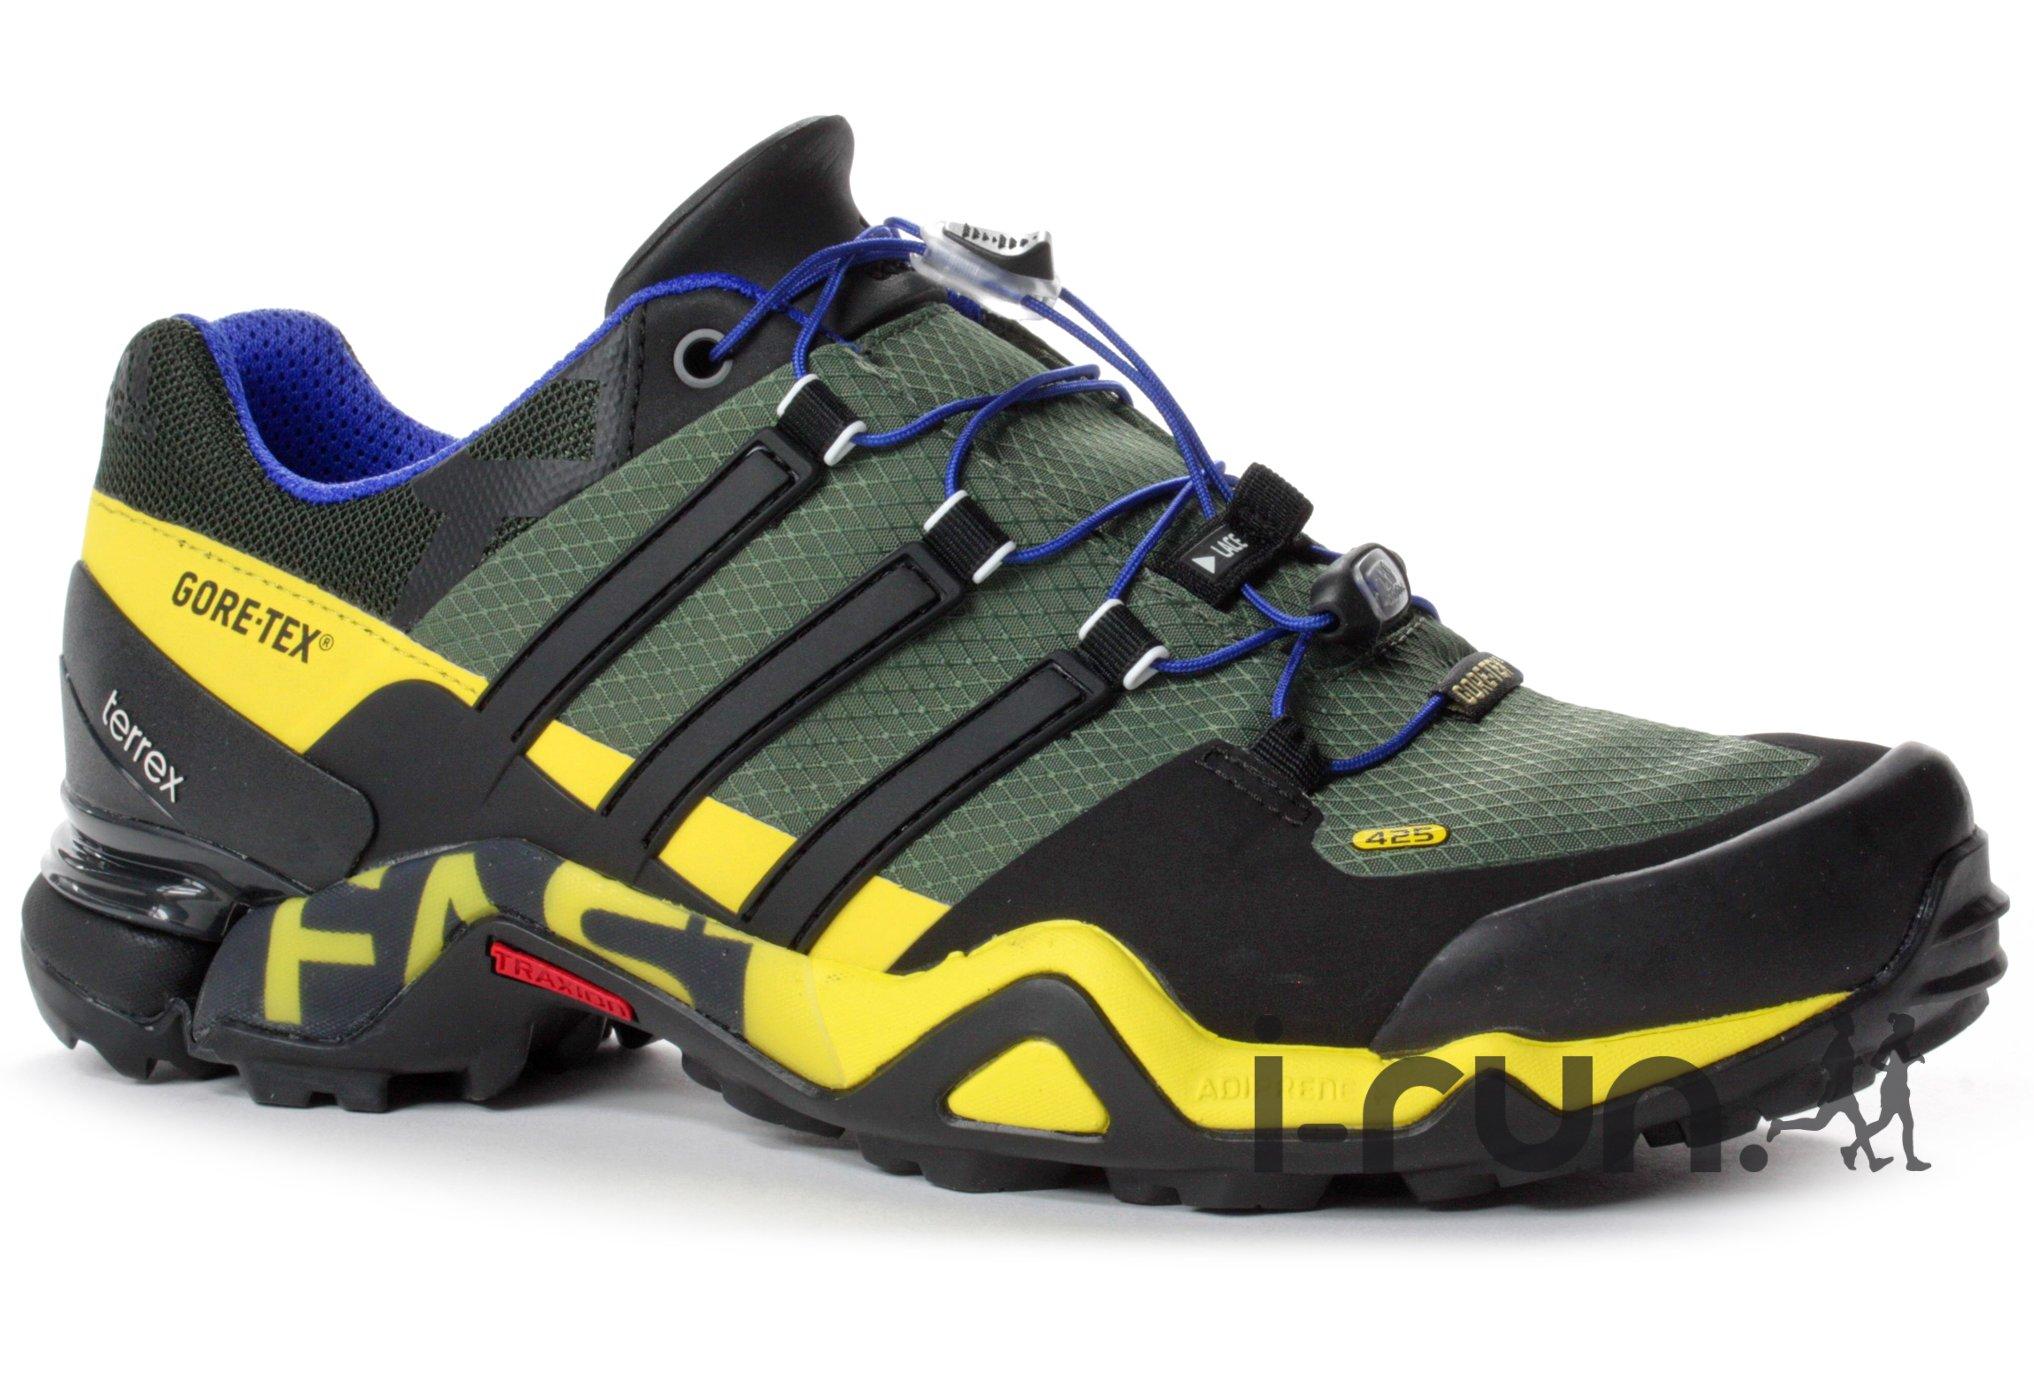 Adidas Terrex Fast X FM Mid GTX Gore Tex Chaussures de